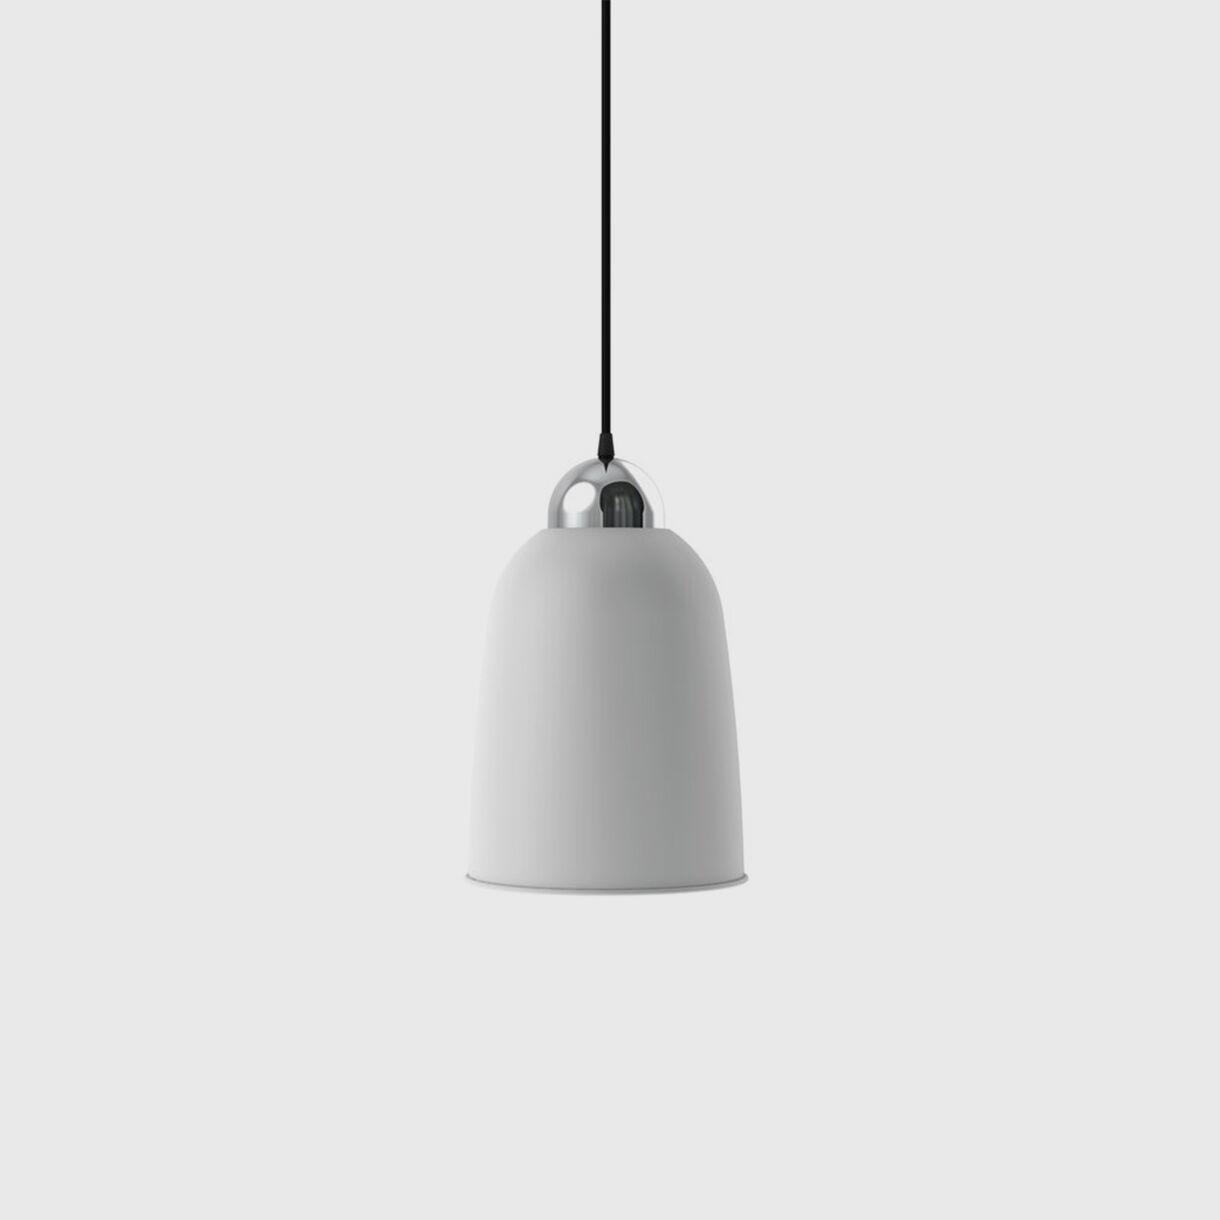 Nepal Pendant, Perky, White Black & Silver